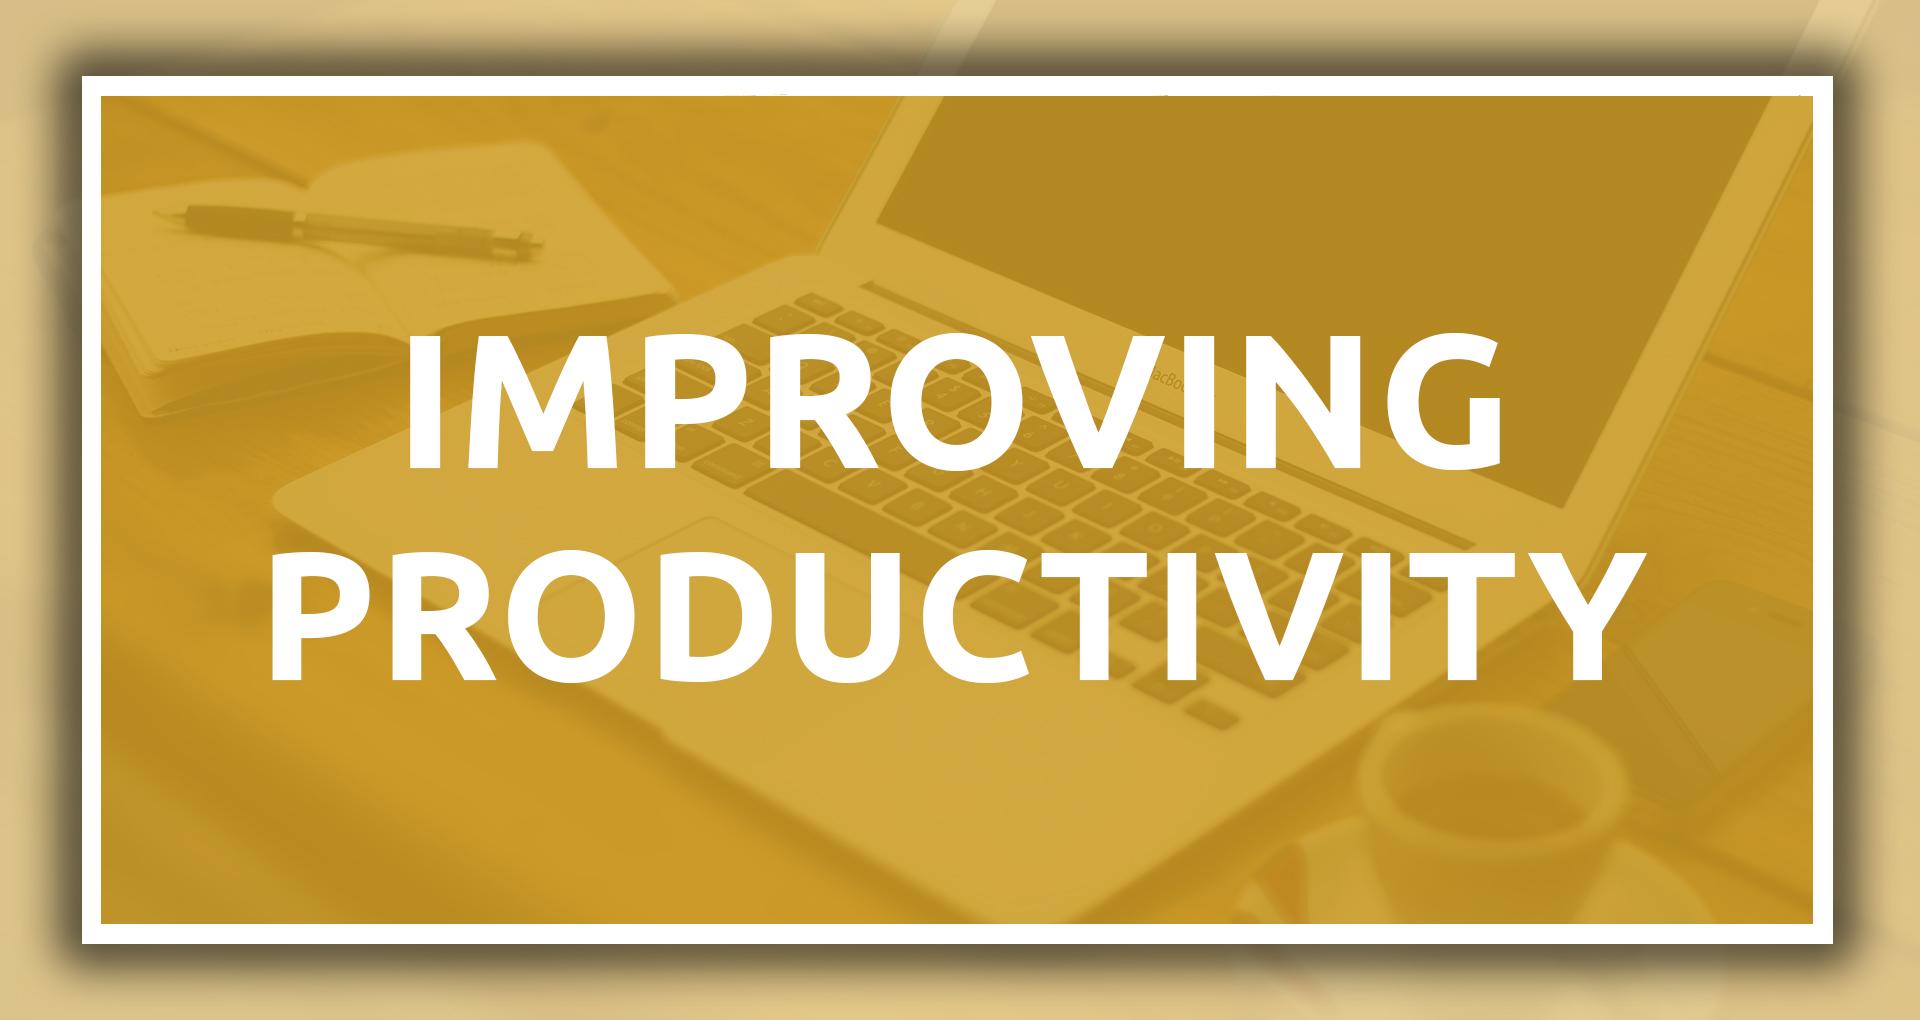 Improving Productivity